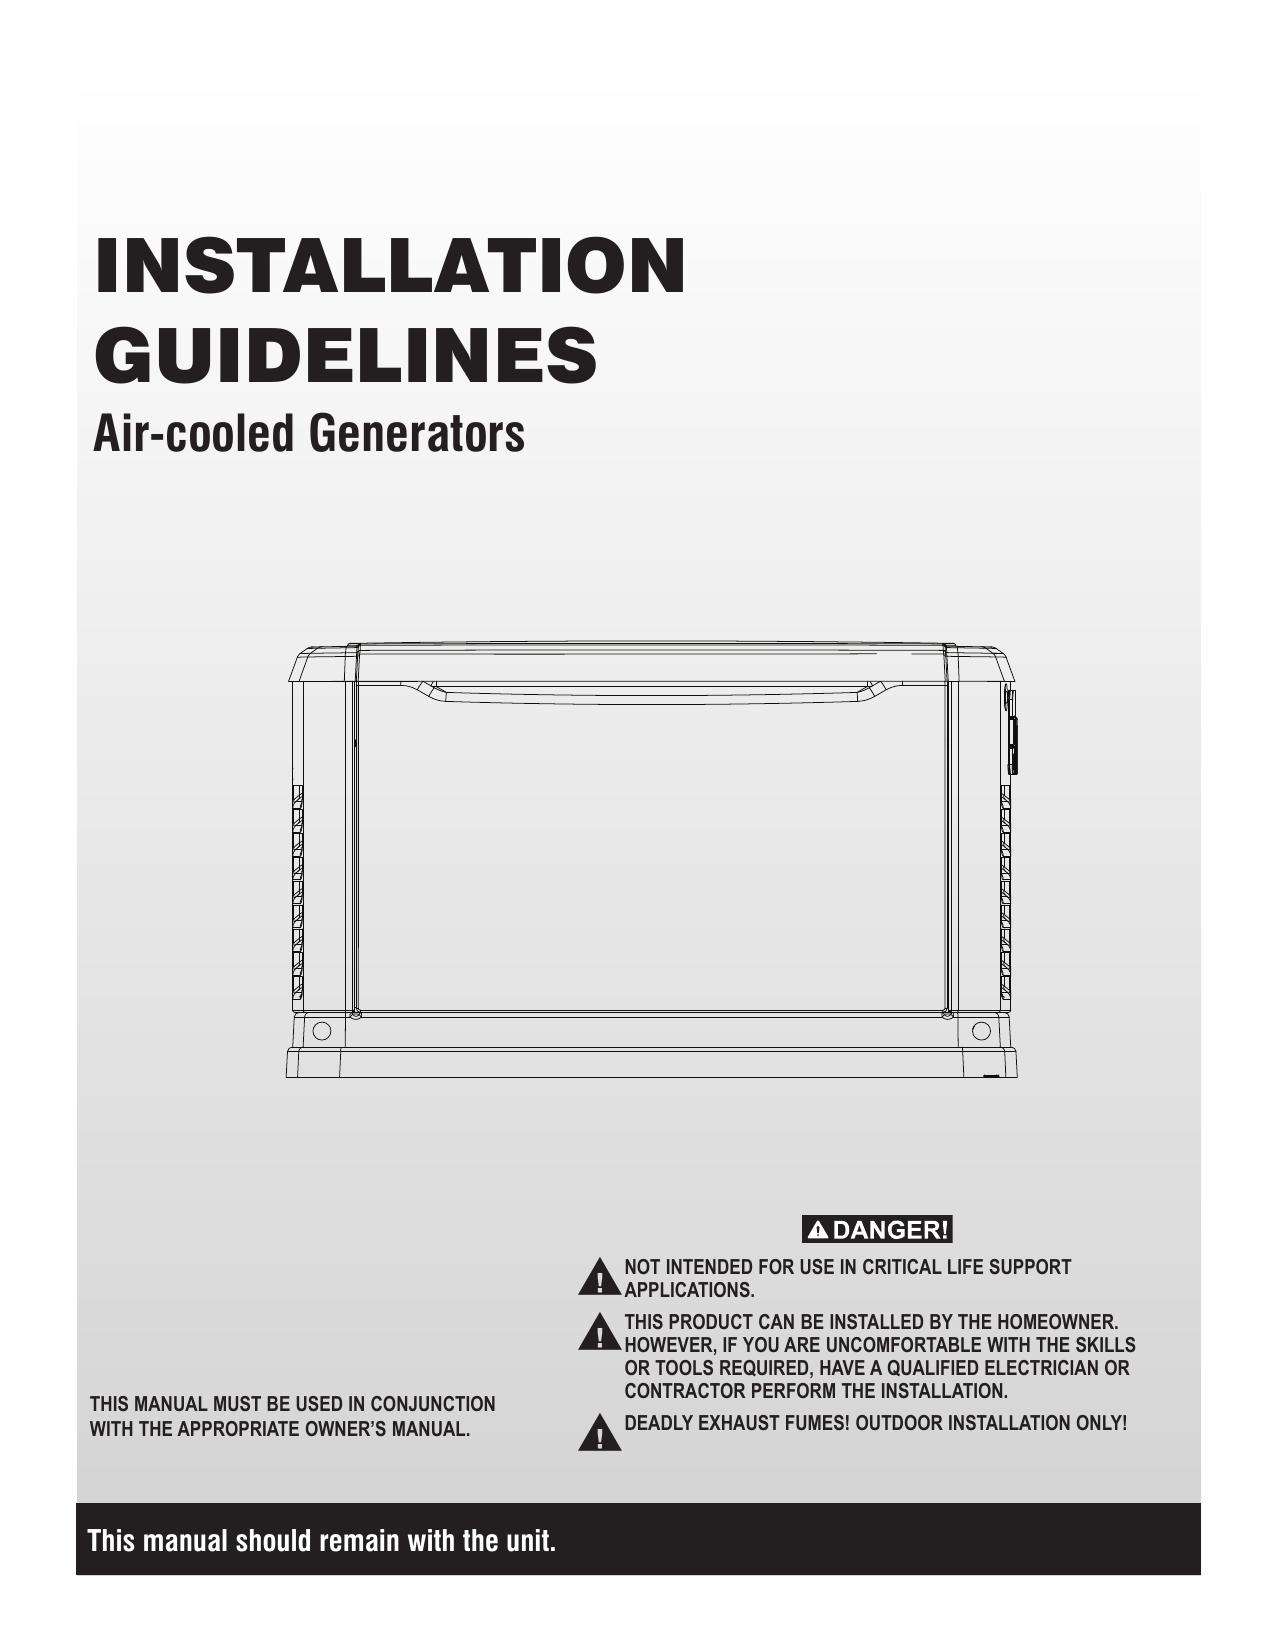 Generac 15 Kw 0062810 Standby Generator Manual Manualzz